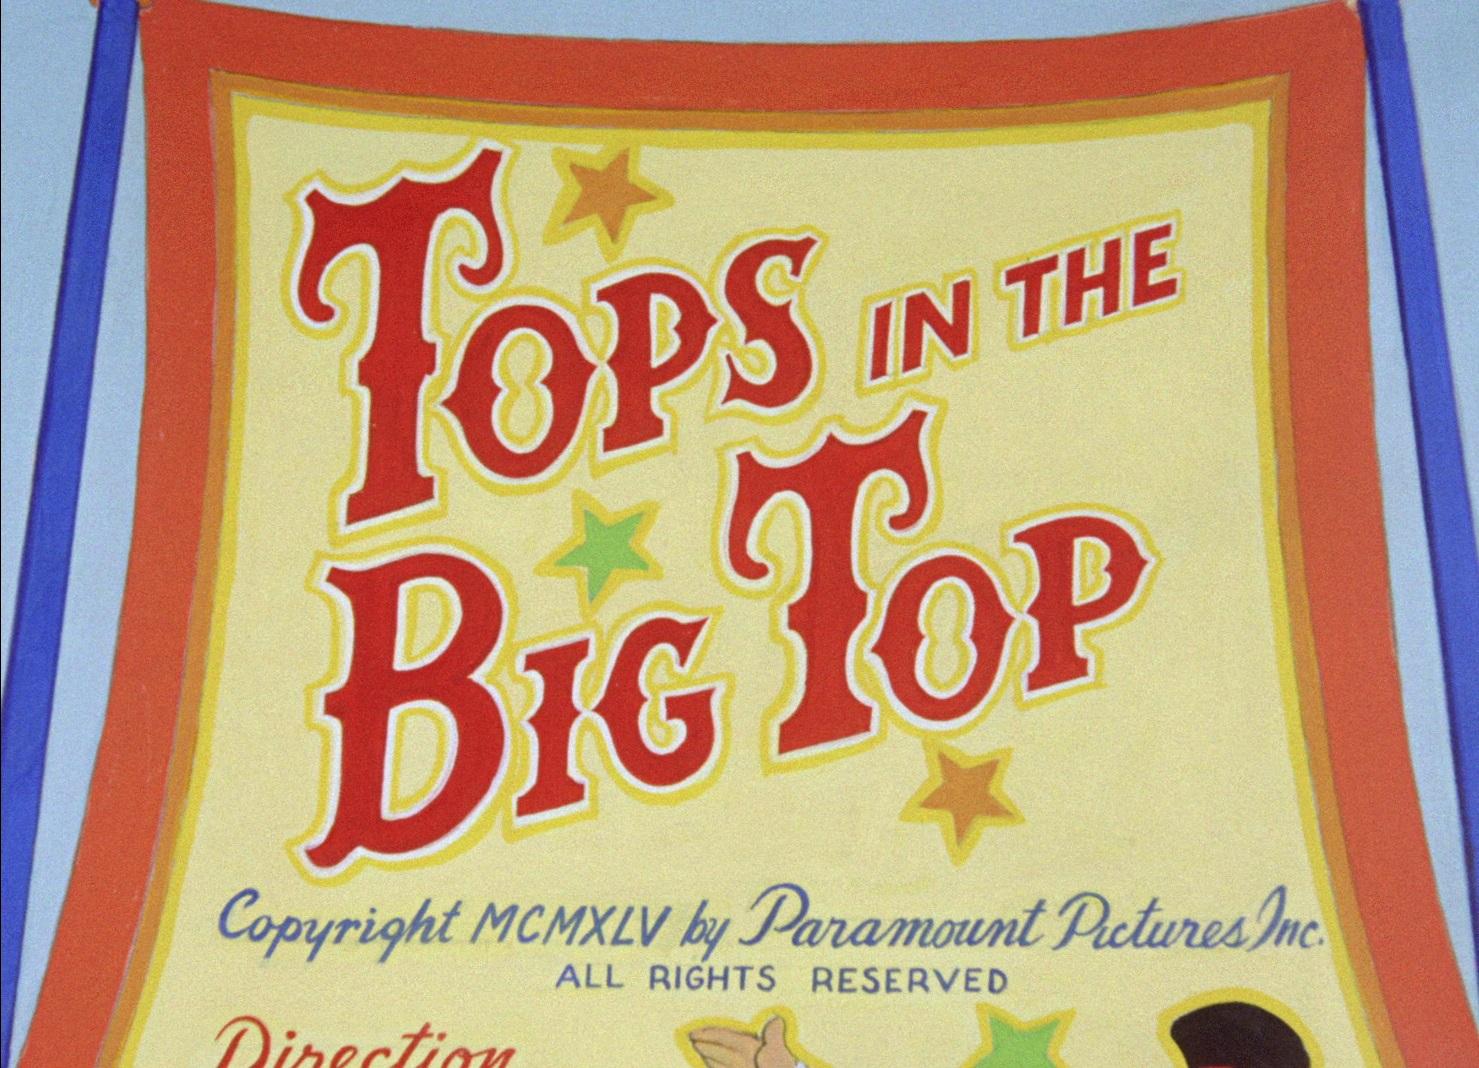 Tops bigtop